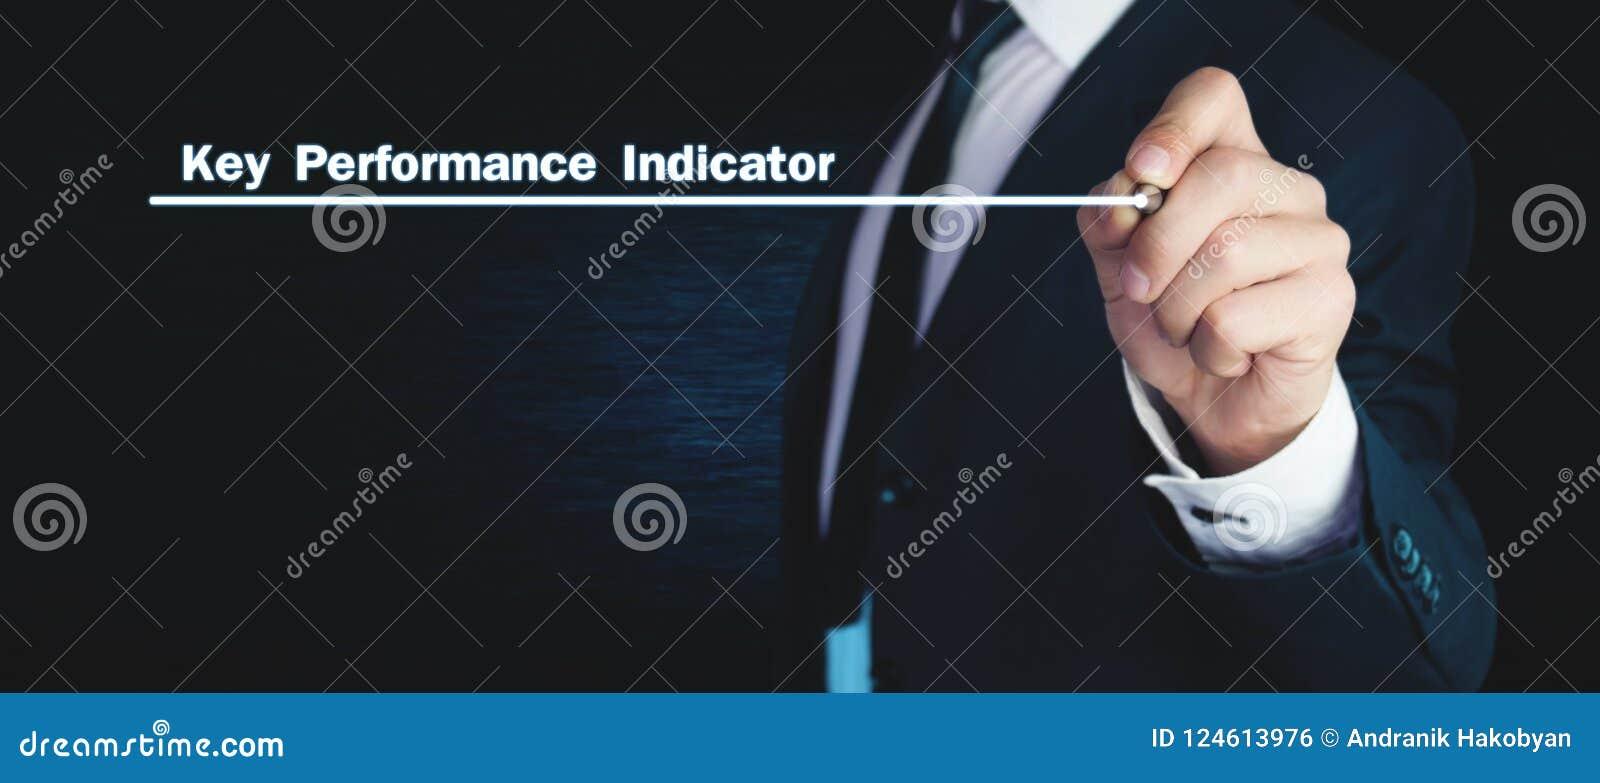 Man writes Key Performance Indicator text on screen.